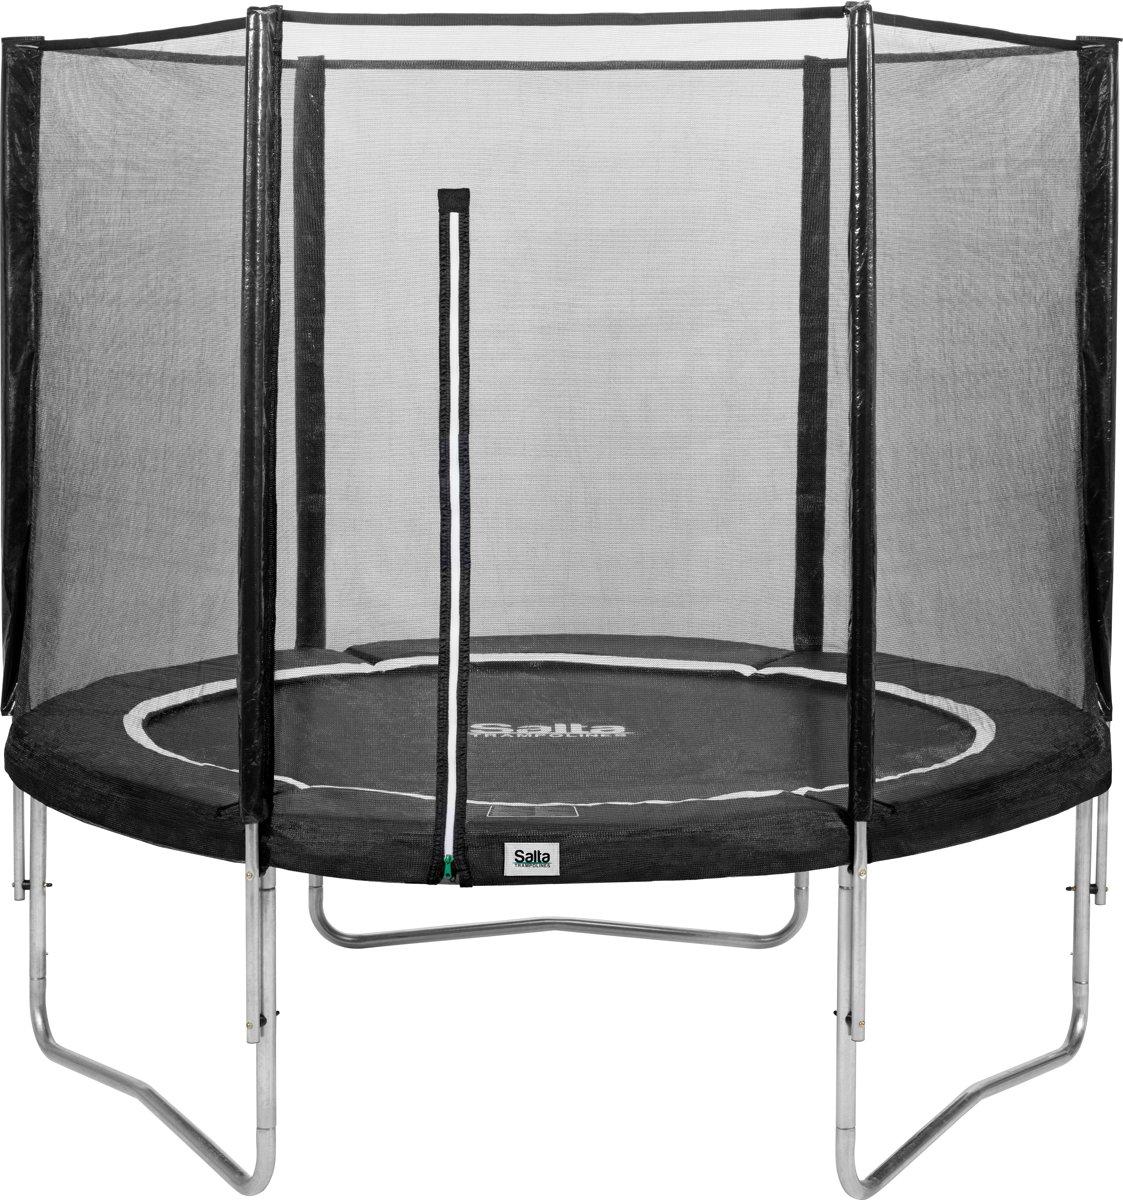 Salta Combo 251 cm Antraciet - Trampoline